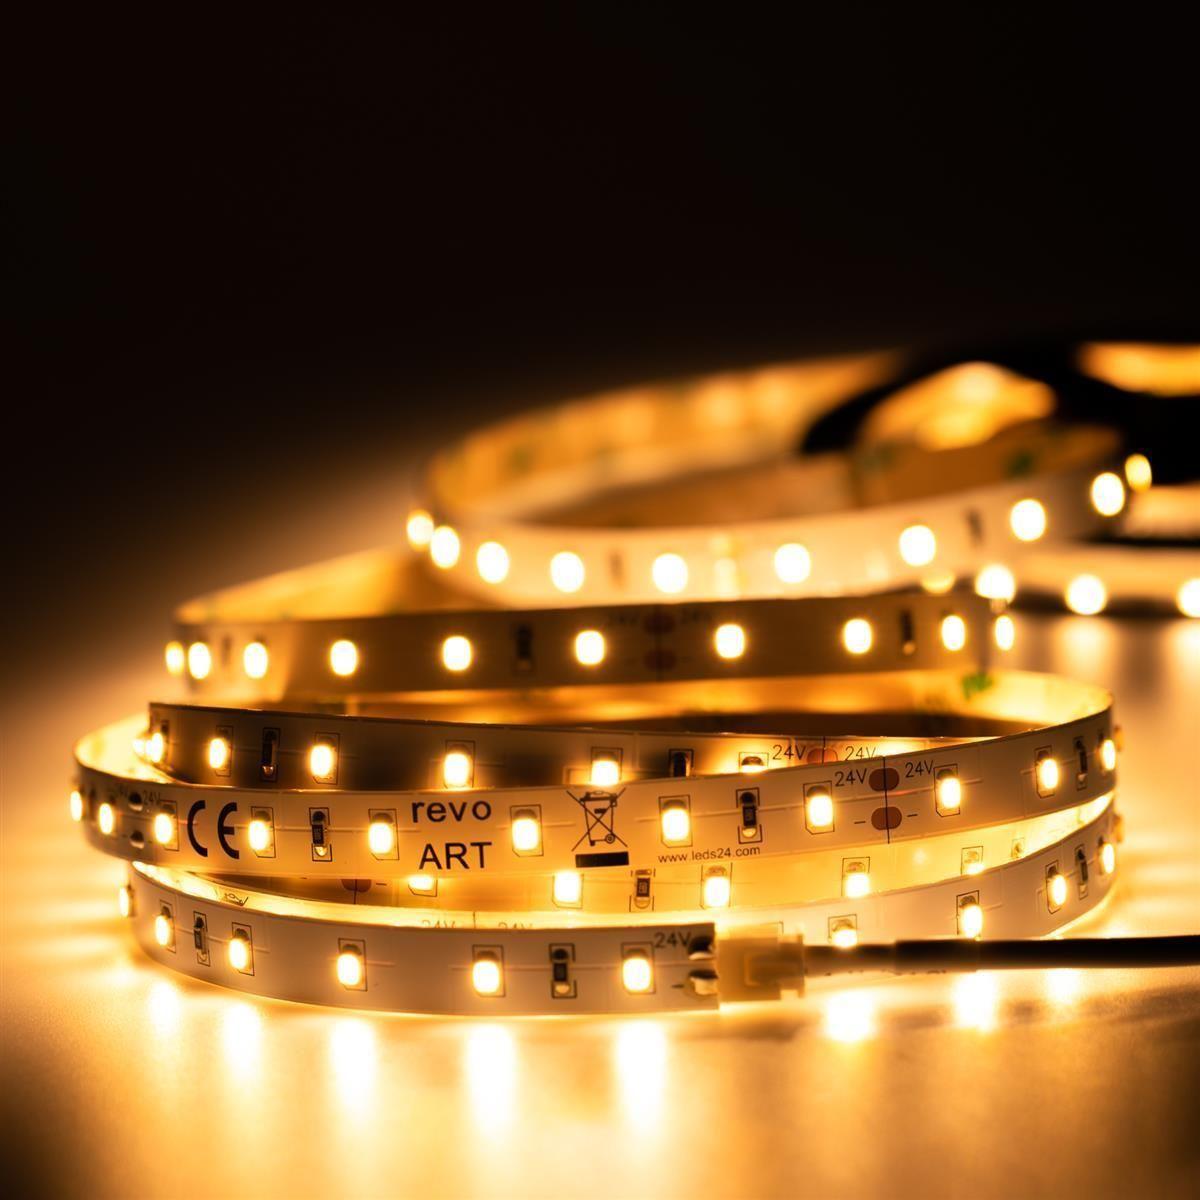 24V LED Streifen – warmweiß – 60 LEDs je Meter – alle 10cm teilbar